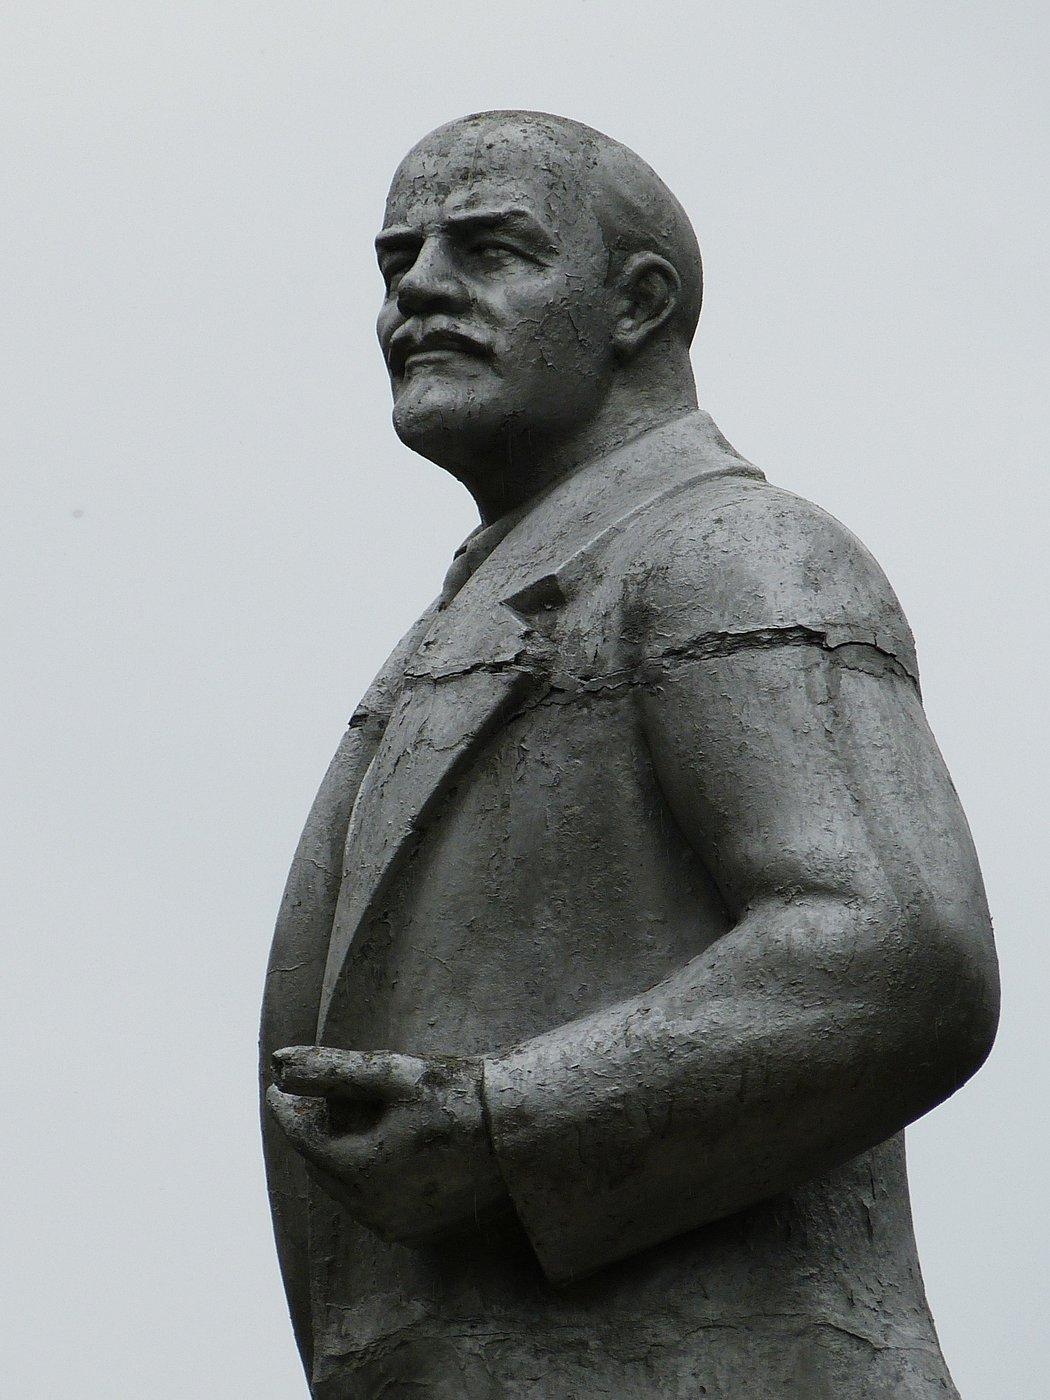 Socha V.I. Lenina